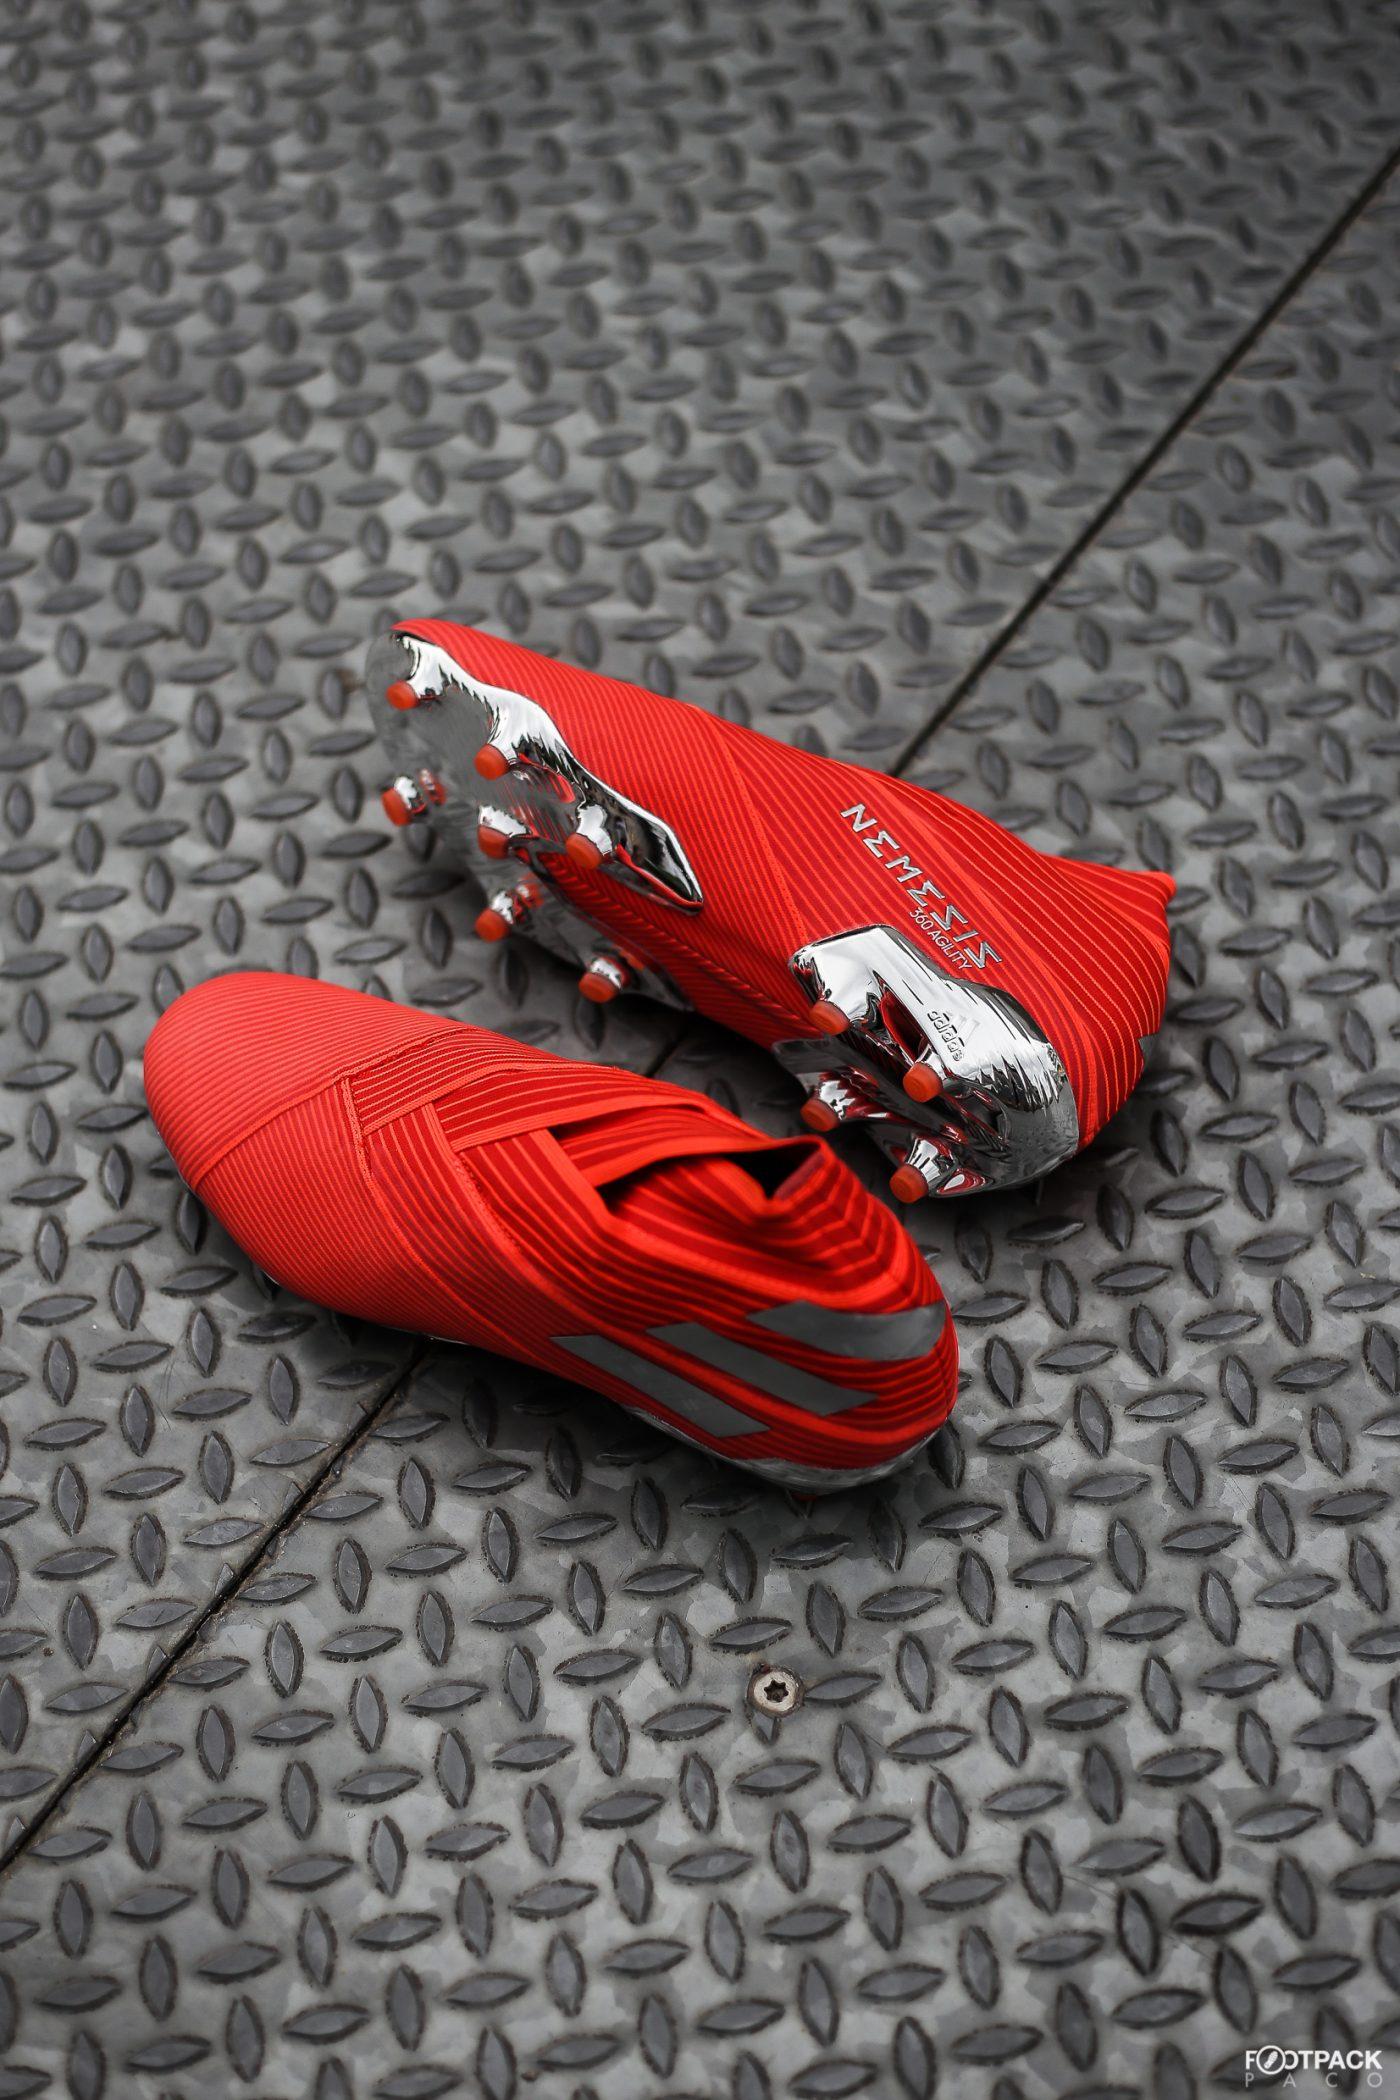 adidas-nemeziz-19-nemeziz19+-mai-2019-footpack-10